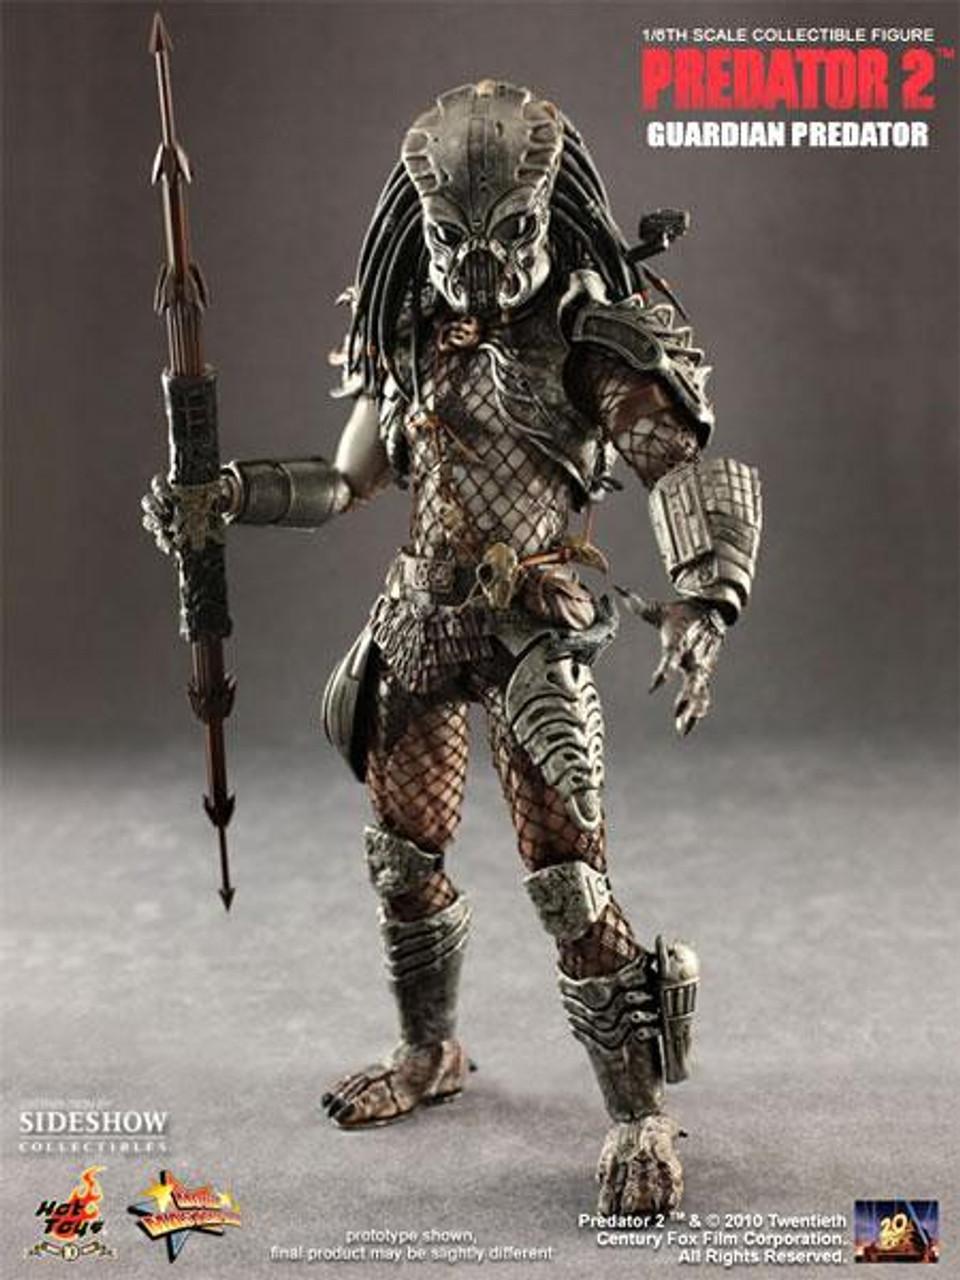 Predator 2 Movie Masterpiece Guardian Predator Exclusive 1/6 Collectible Figure